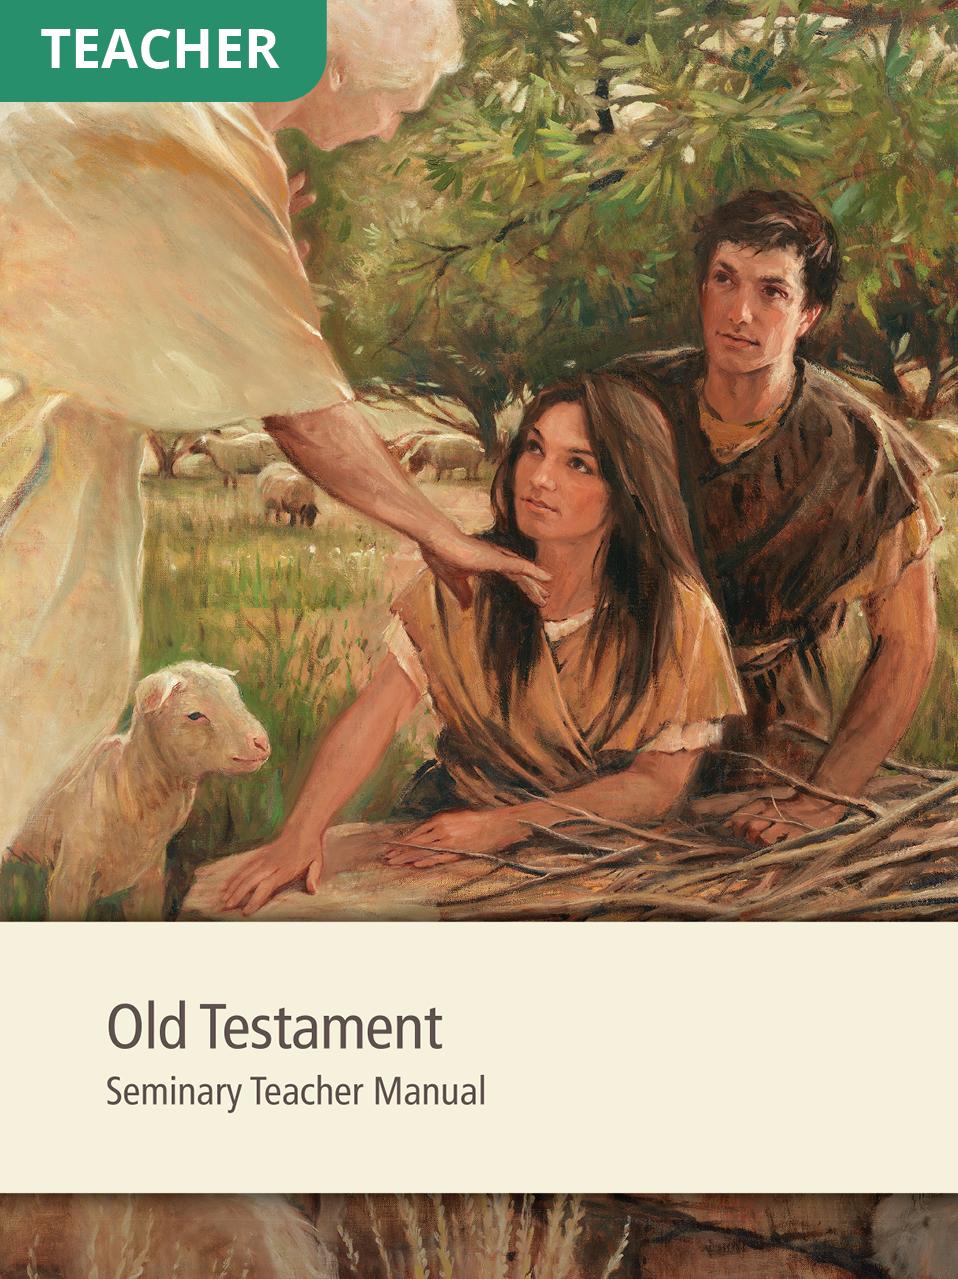 Old Testament Seminary Teacher Manual